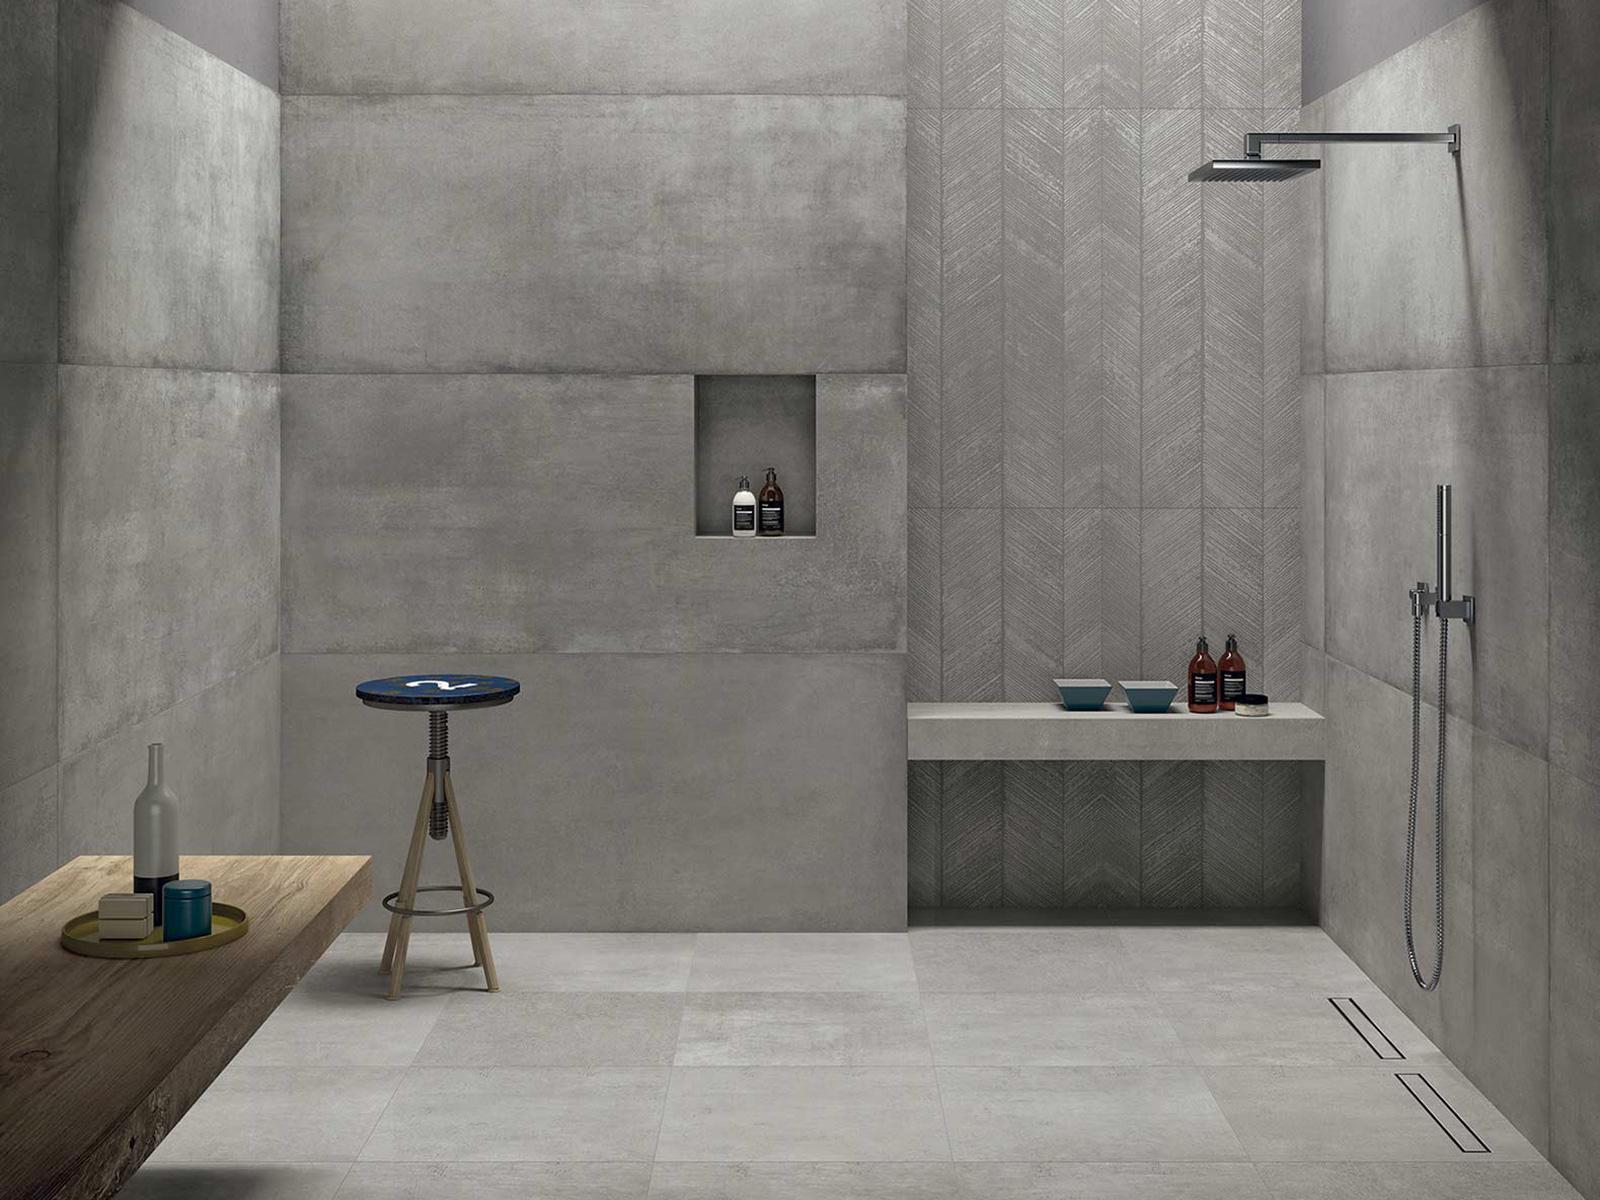 Dusche in betonoptik aus grossformatigen keramikplatten granimor - Betonoptik wand bad ...